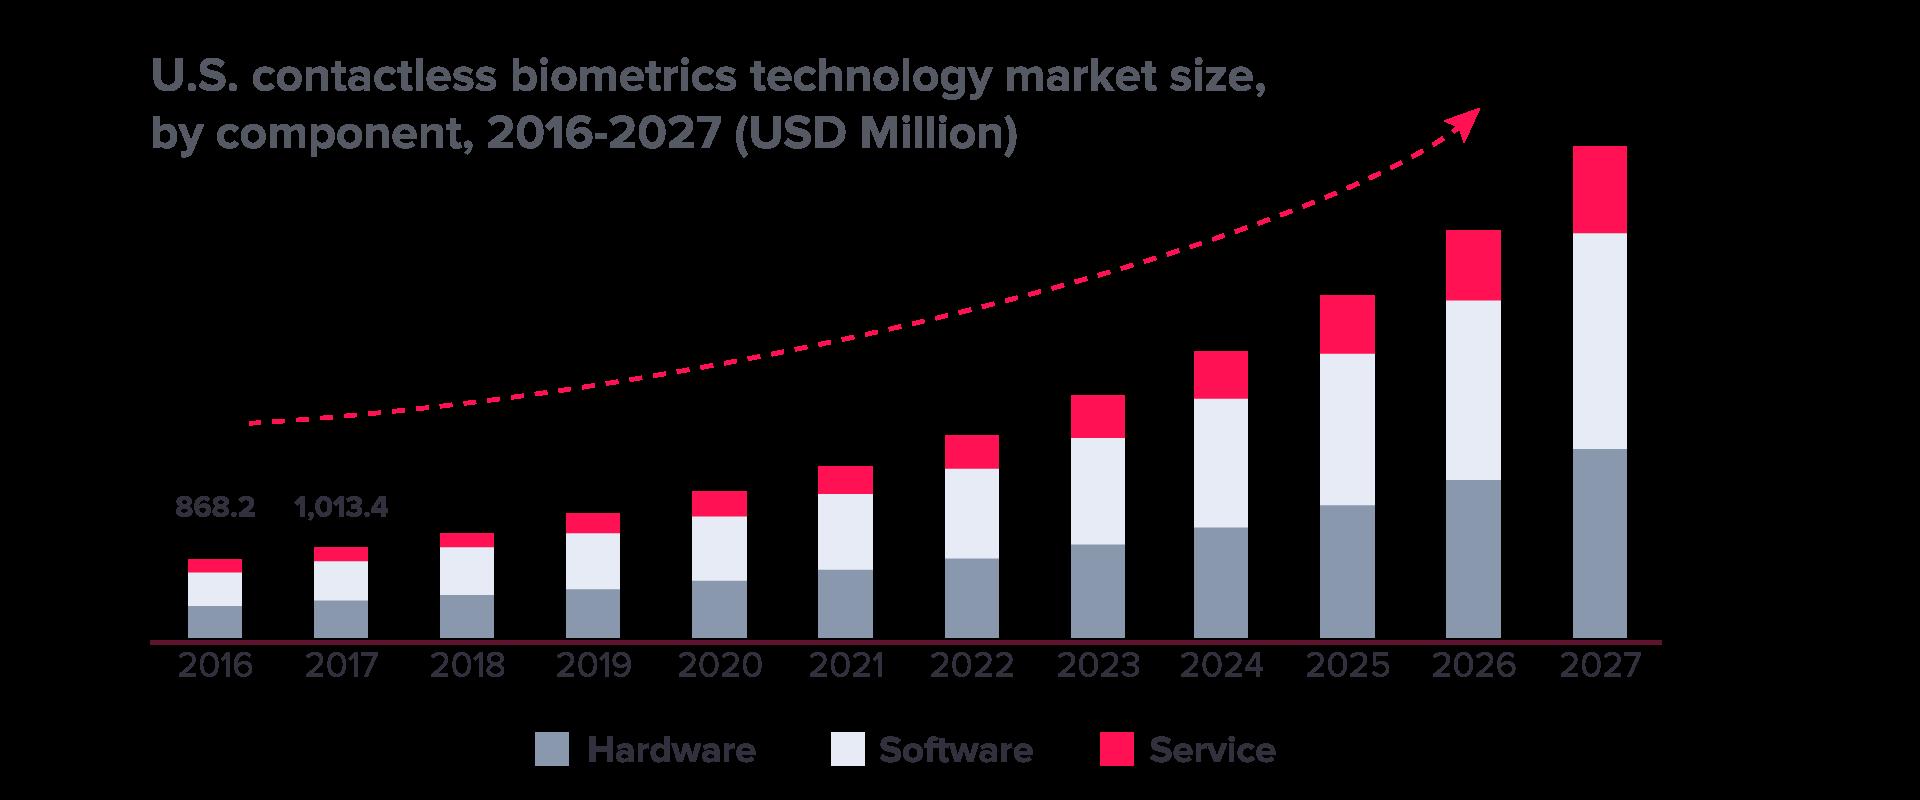 https://recfaces.com/wp-content/uploads/2020/12/biometrics-technology-market.png